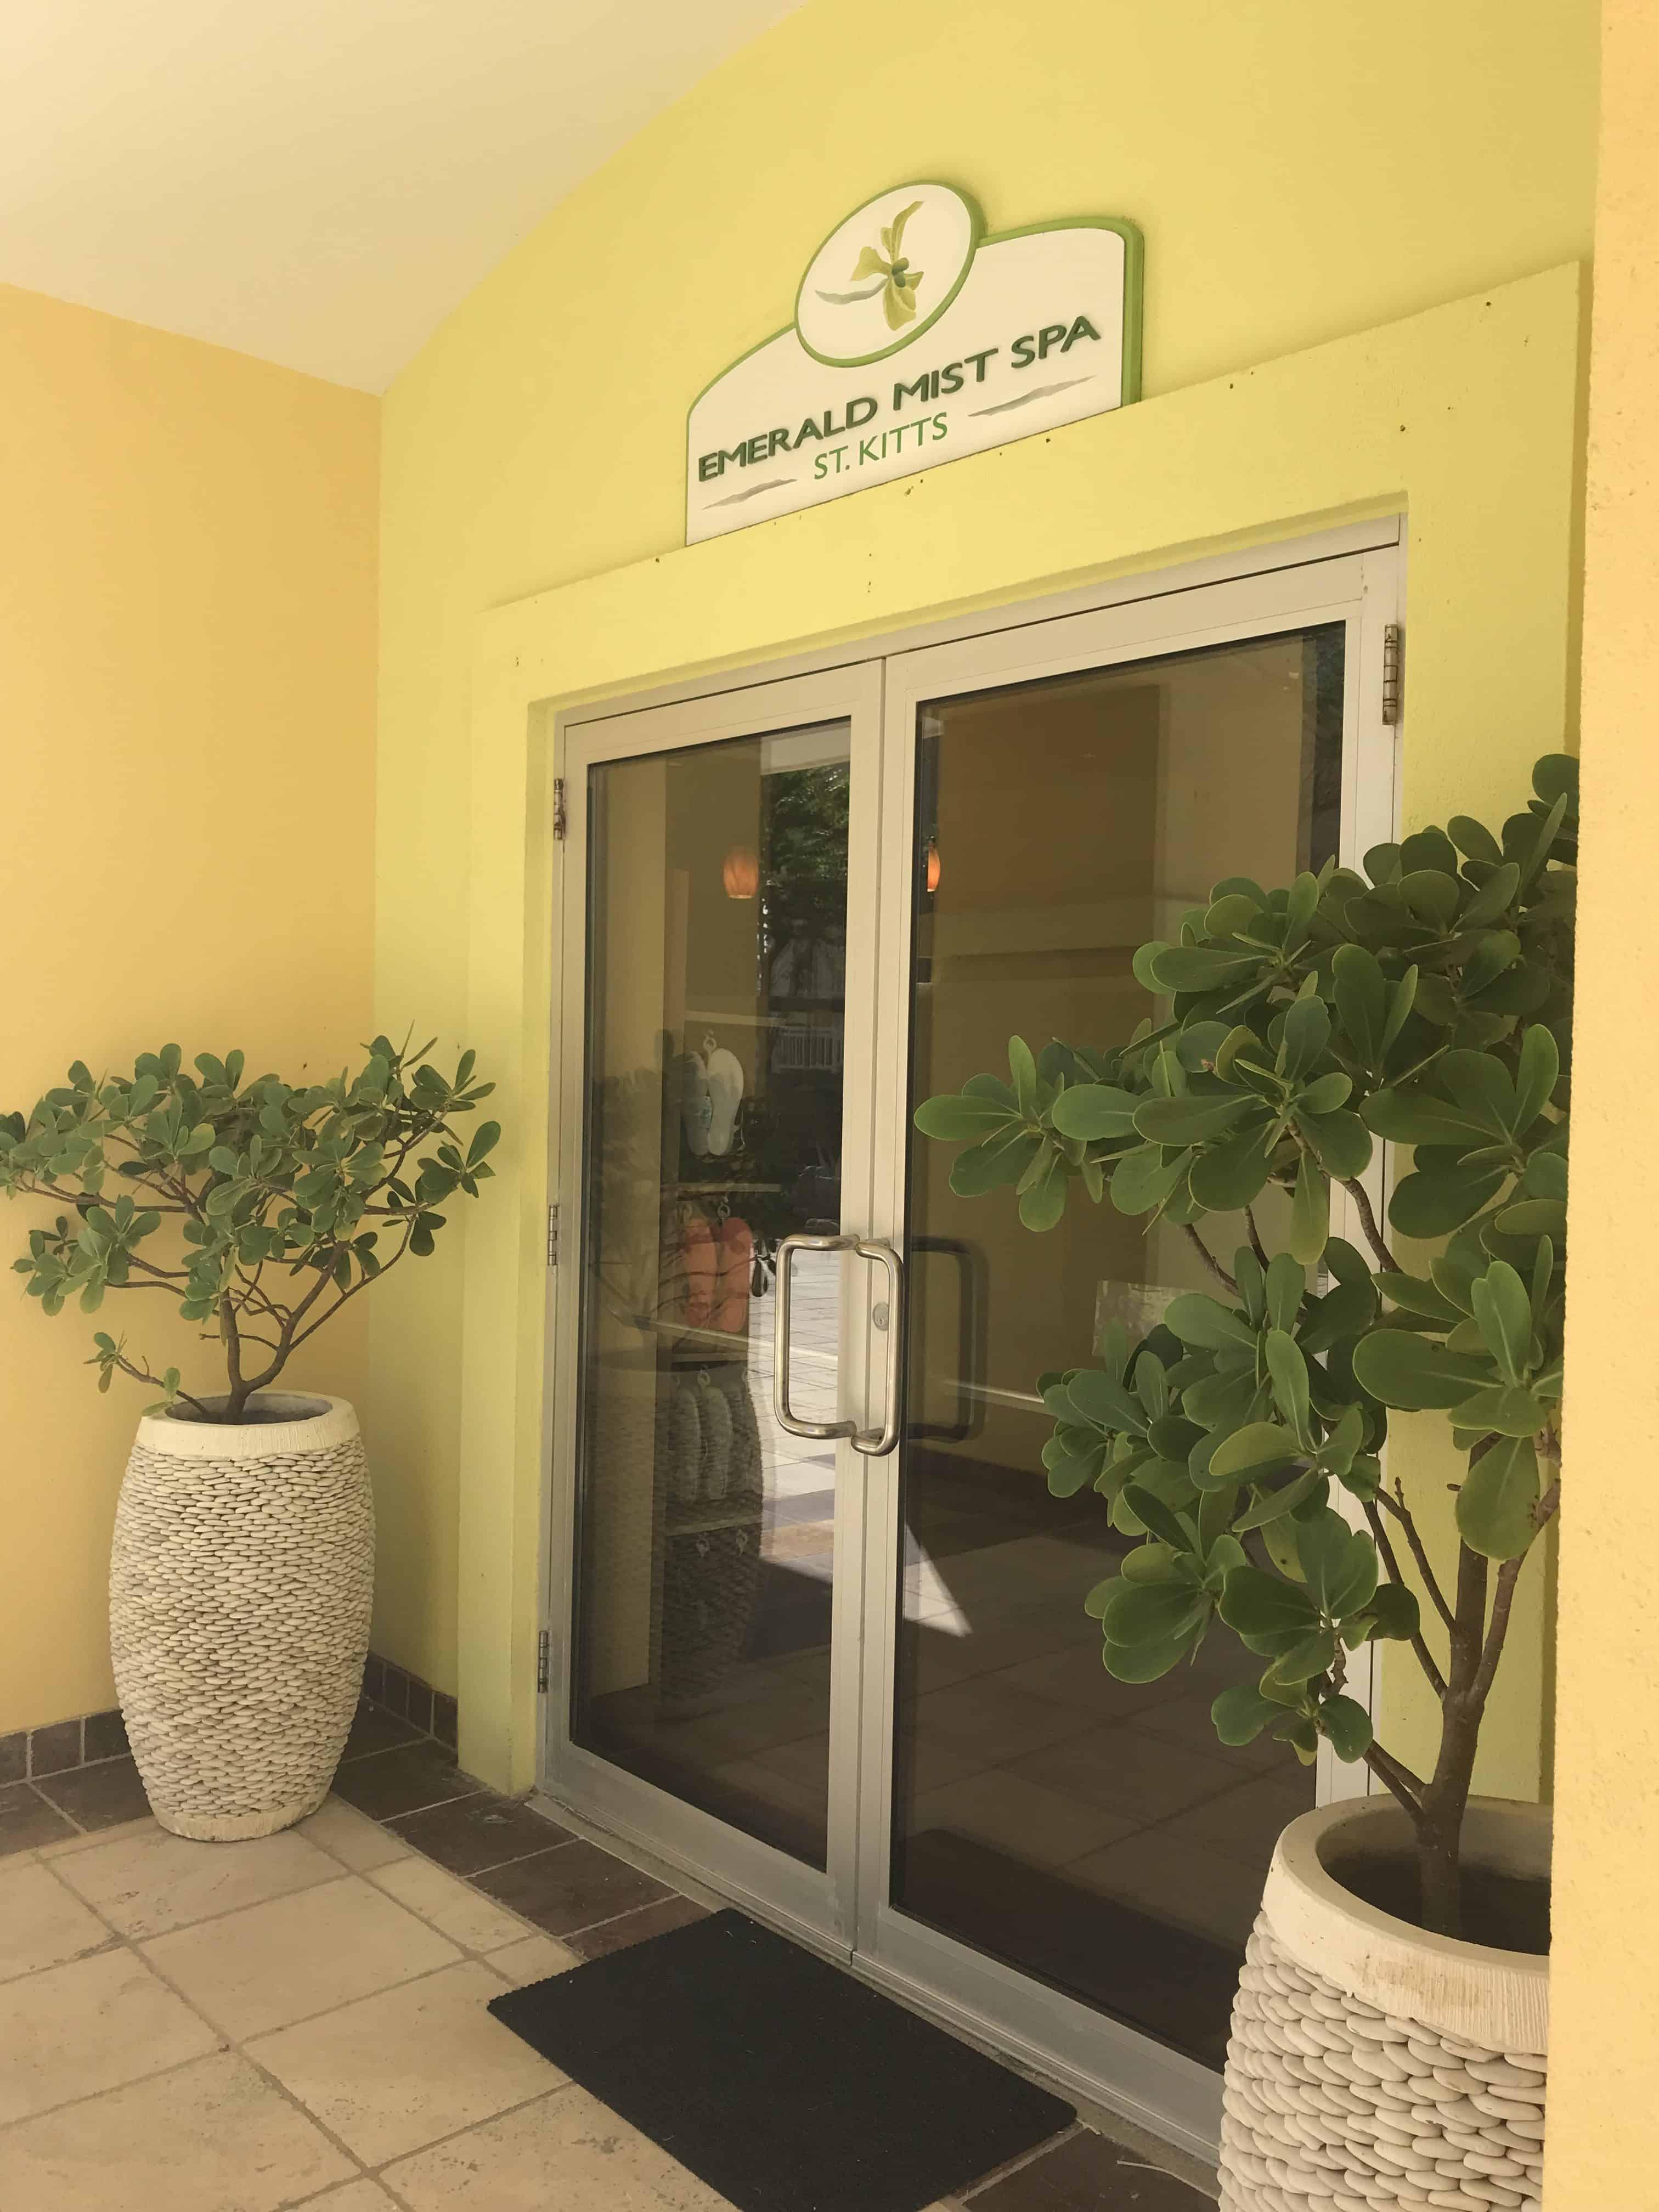 St. Kitts Marriott Resort - Emerald Mist Spa Review